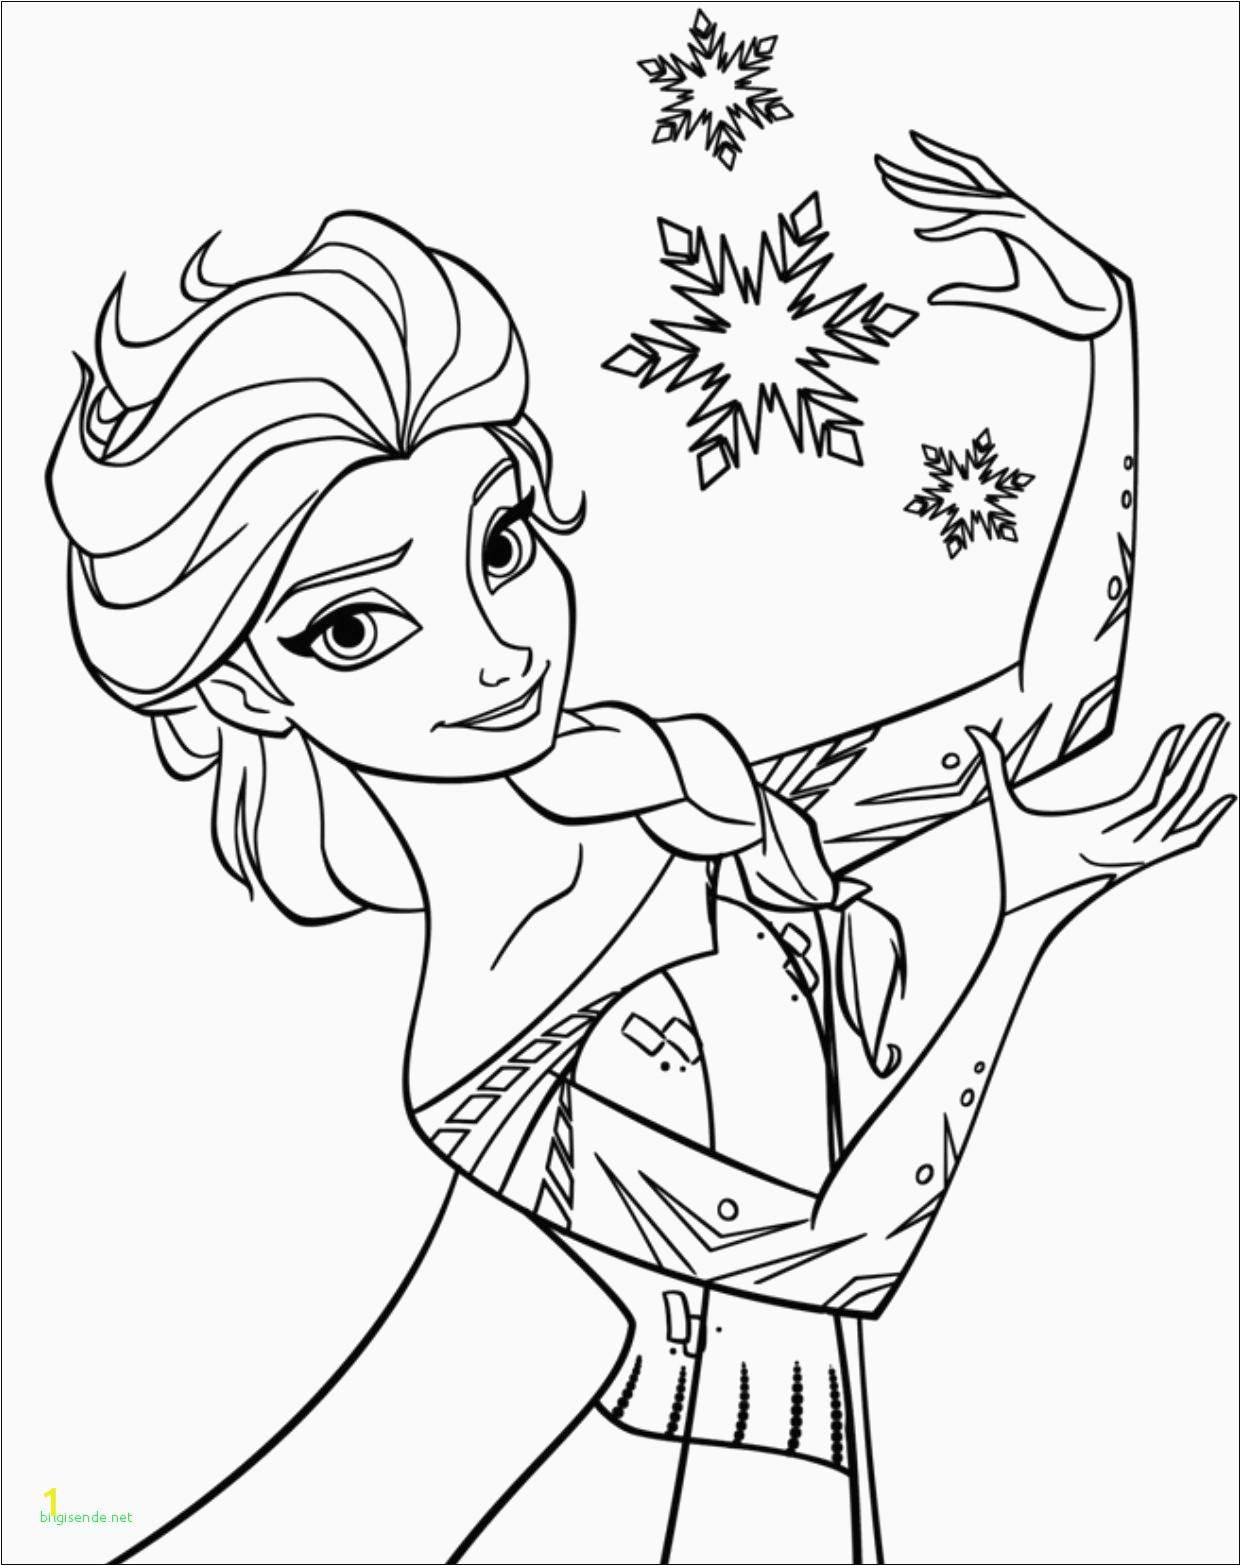 Disney Coloring Pages Elsa and Anna Anna Und Elsa Ausmalbilder Luxus Luxury Disney Princess